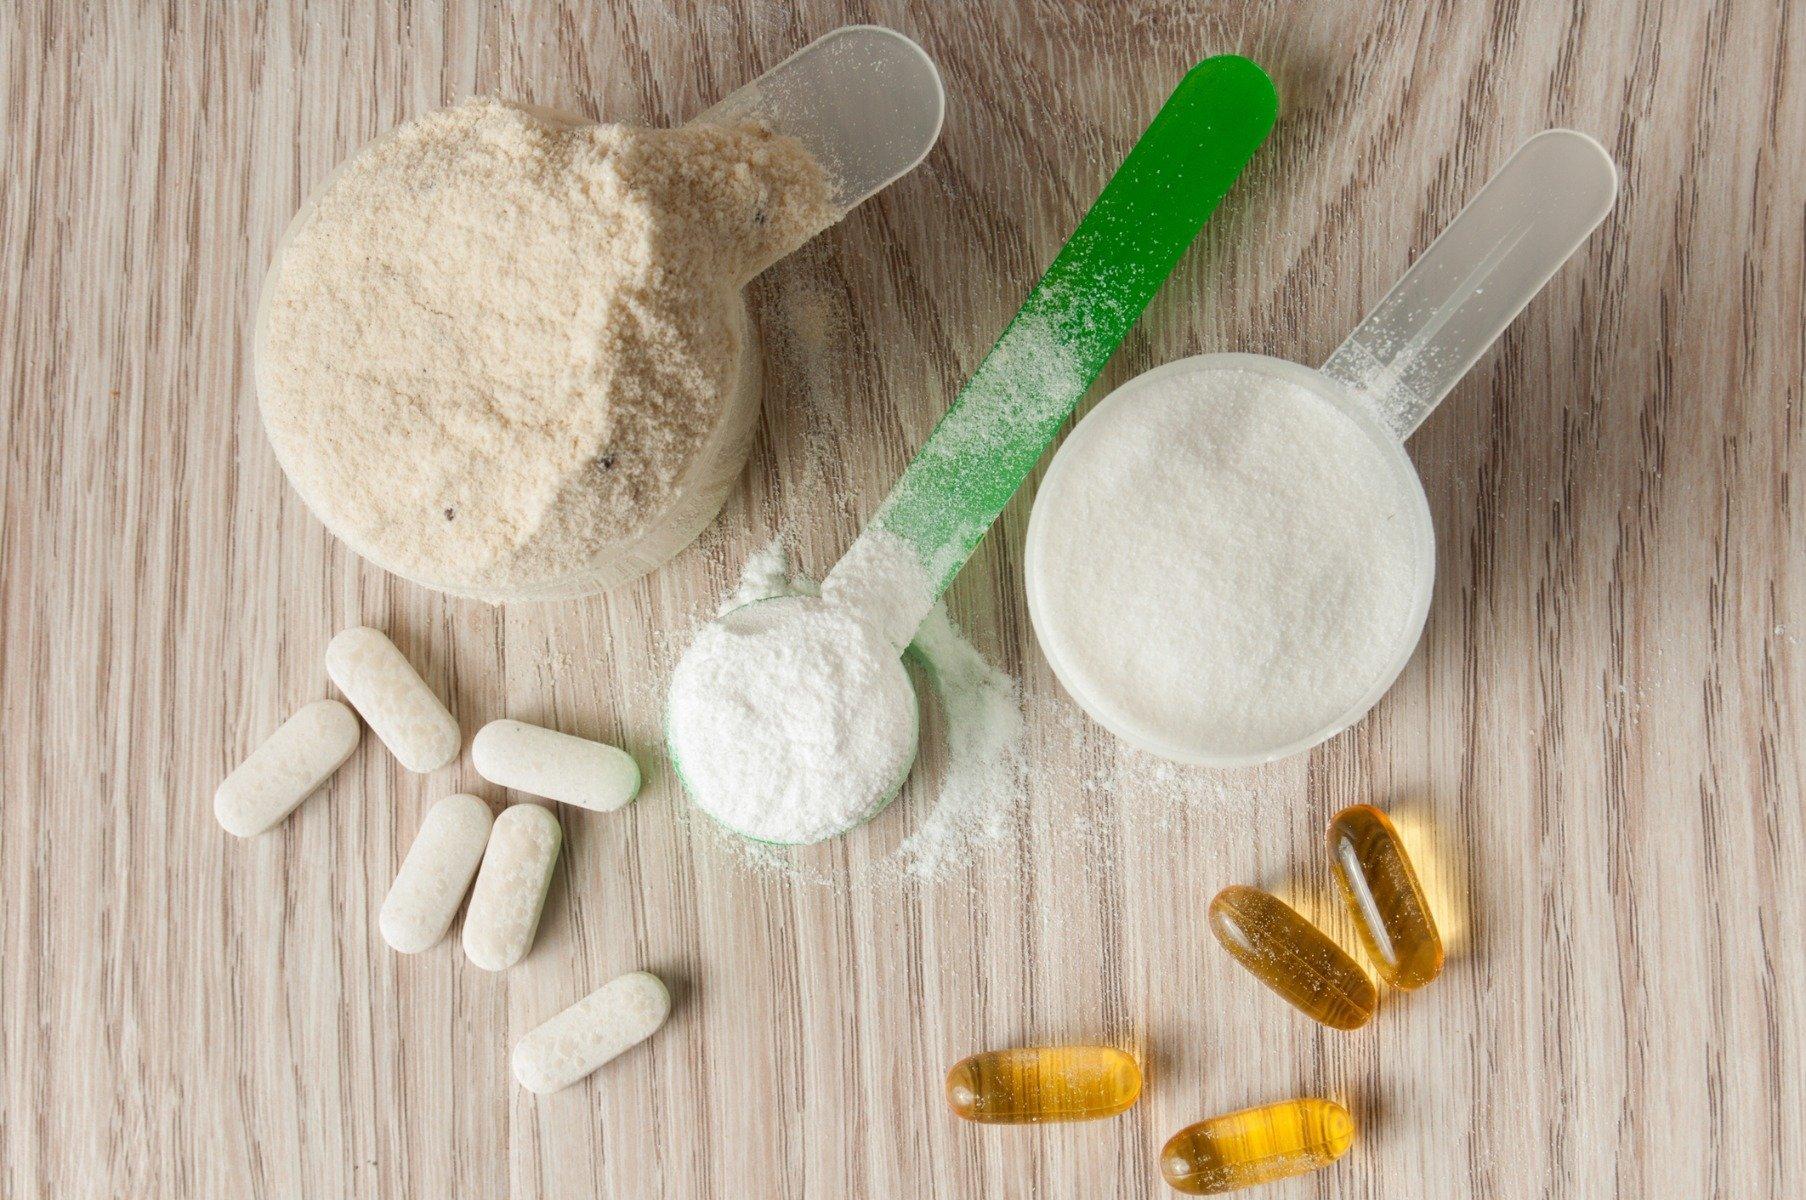 Razlogi za pomanjkanje glutamina